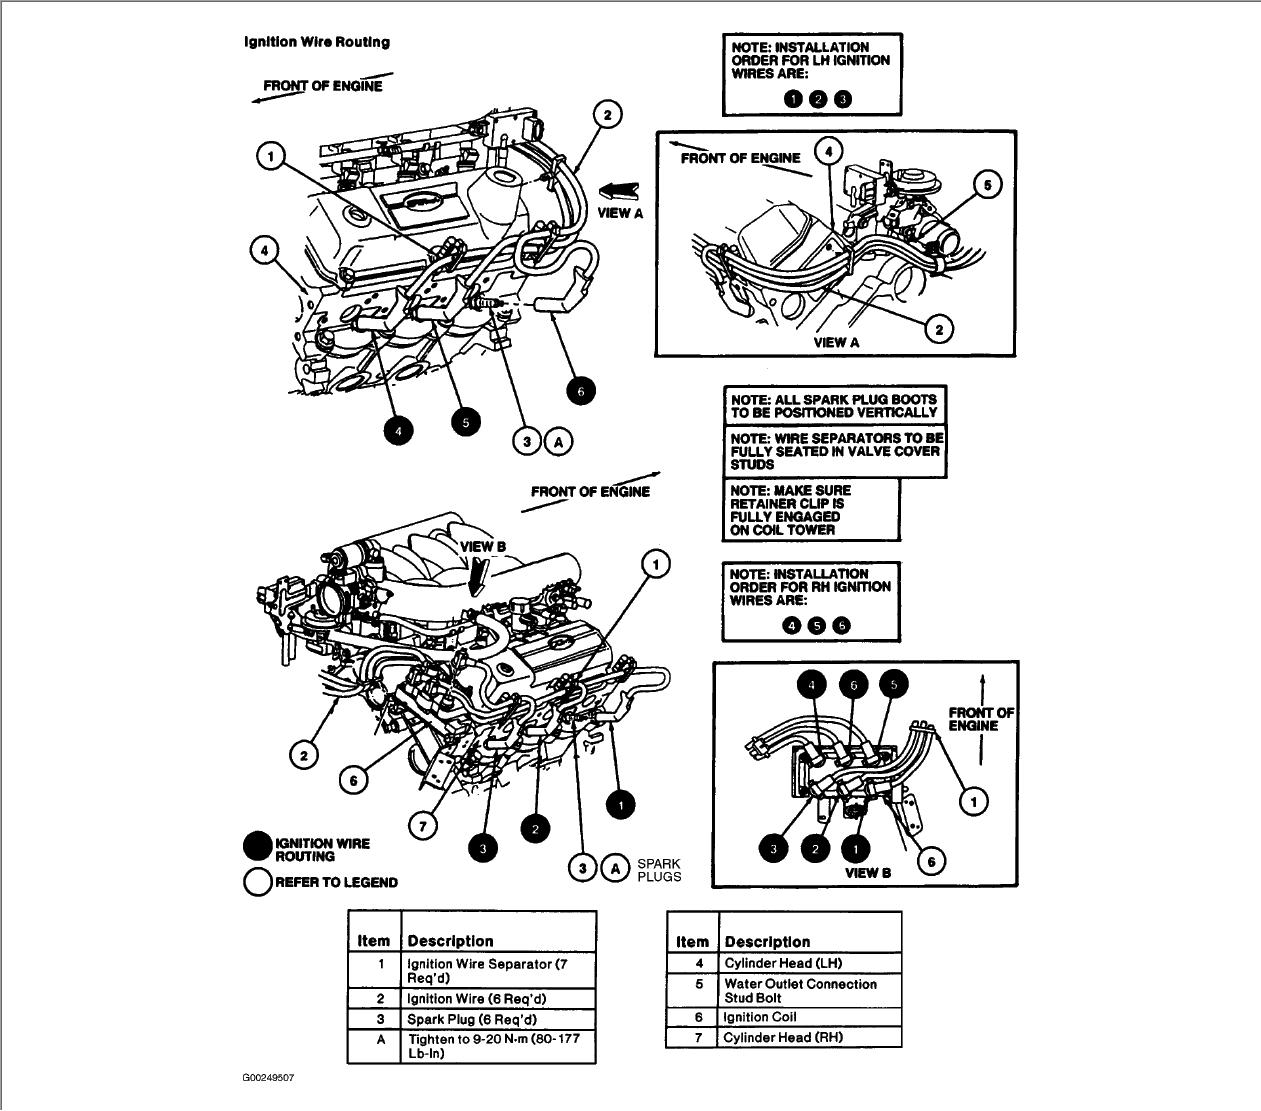 2002 Ford Windstar Coil Pack Firing Order